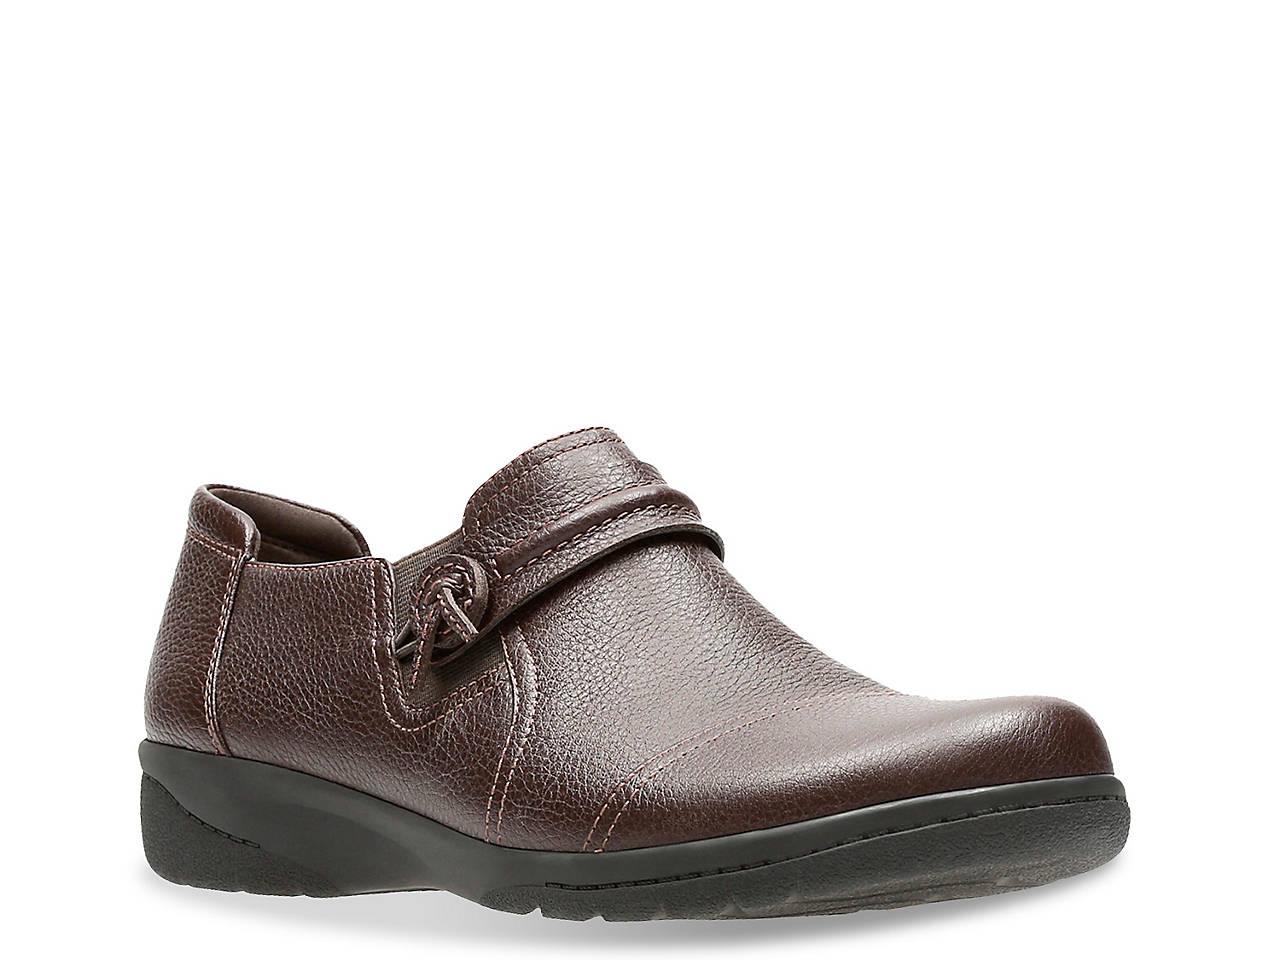 c4cd9330240 Clarks Cheyn Madi Slip-On Women s Shoes